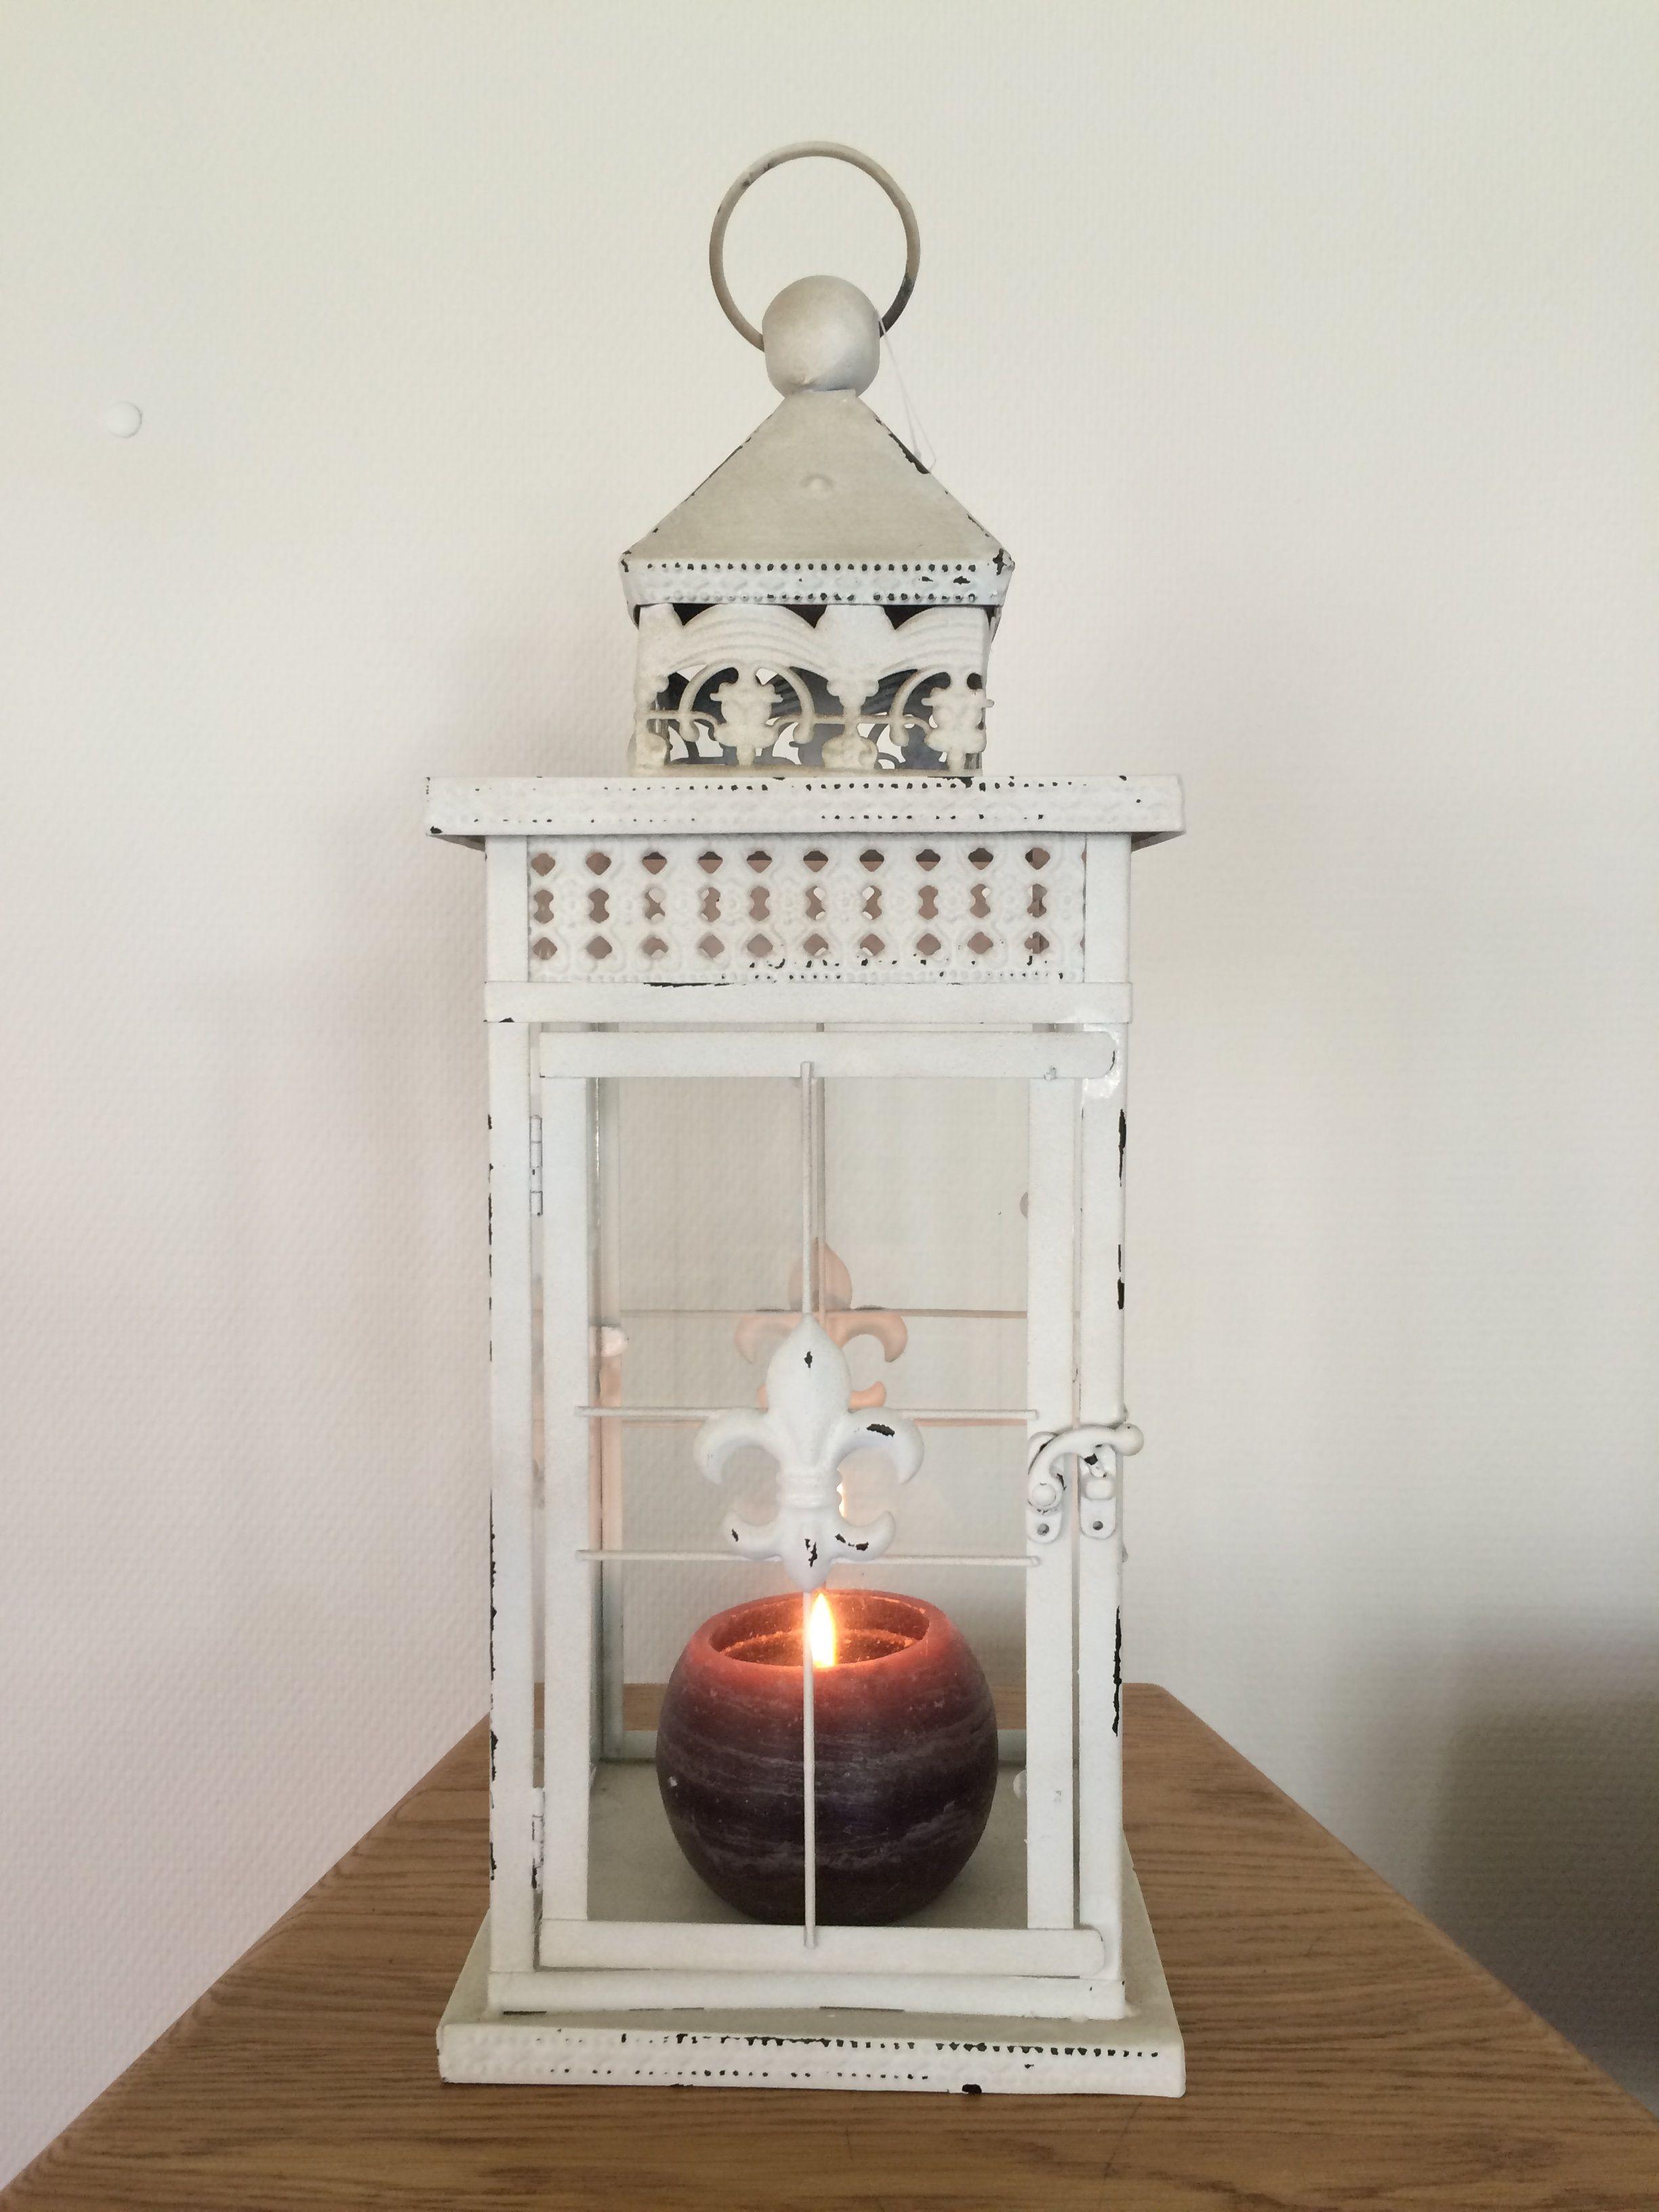 Stormlantaarn white rust metaal deco rustique be - Deco huis exterieur ...